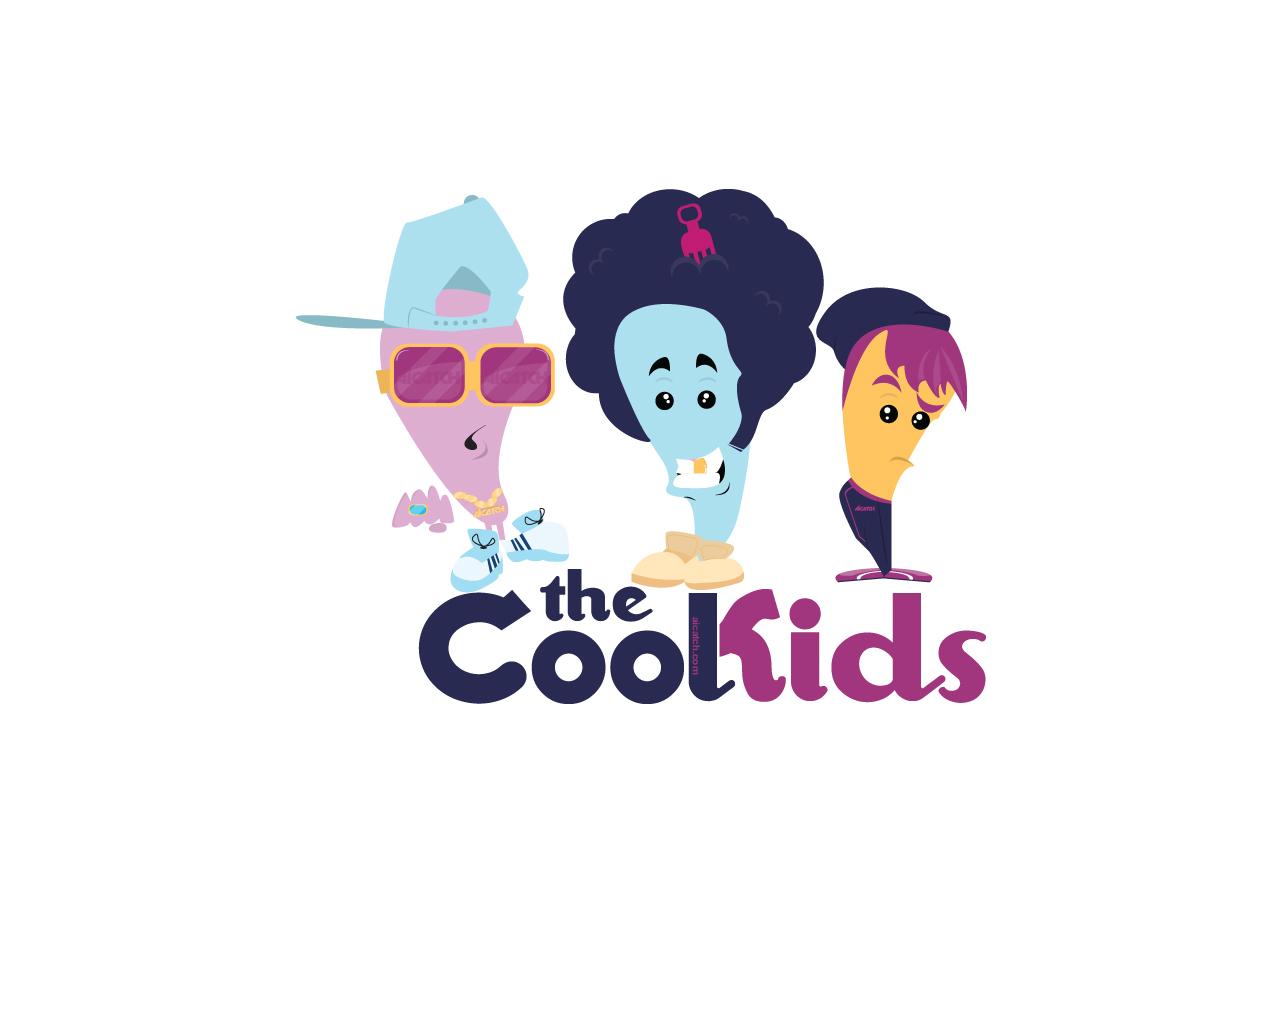 the Cool Kids by Msch on DeviantArt